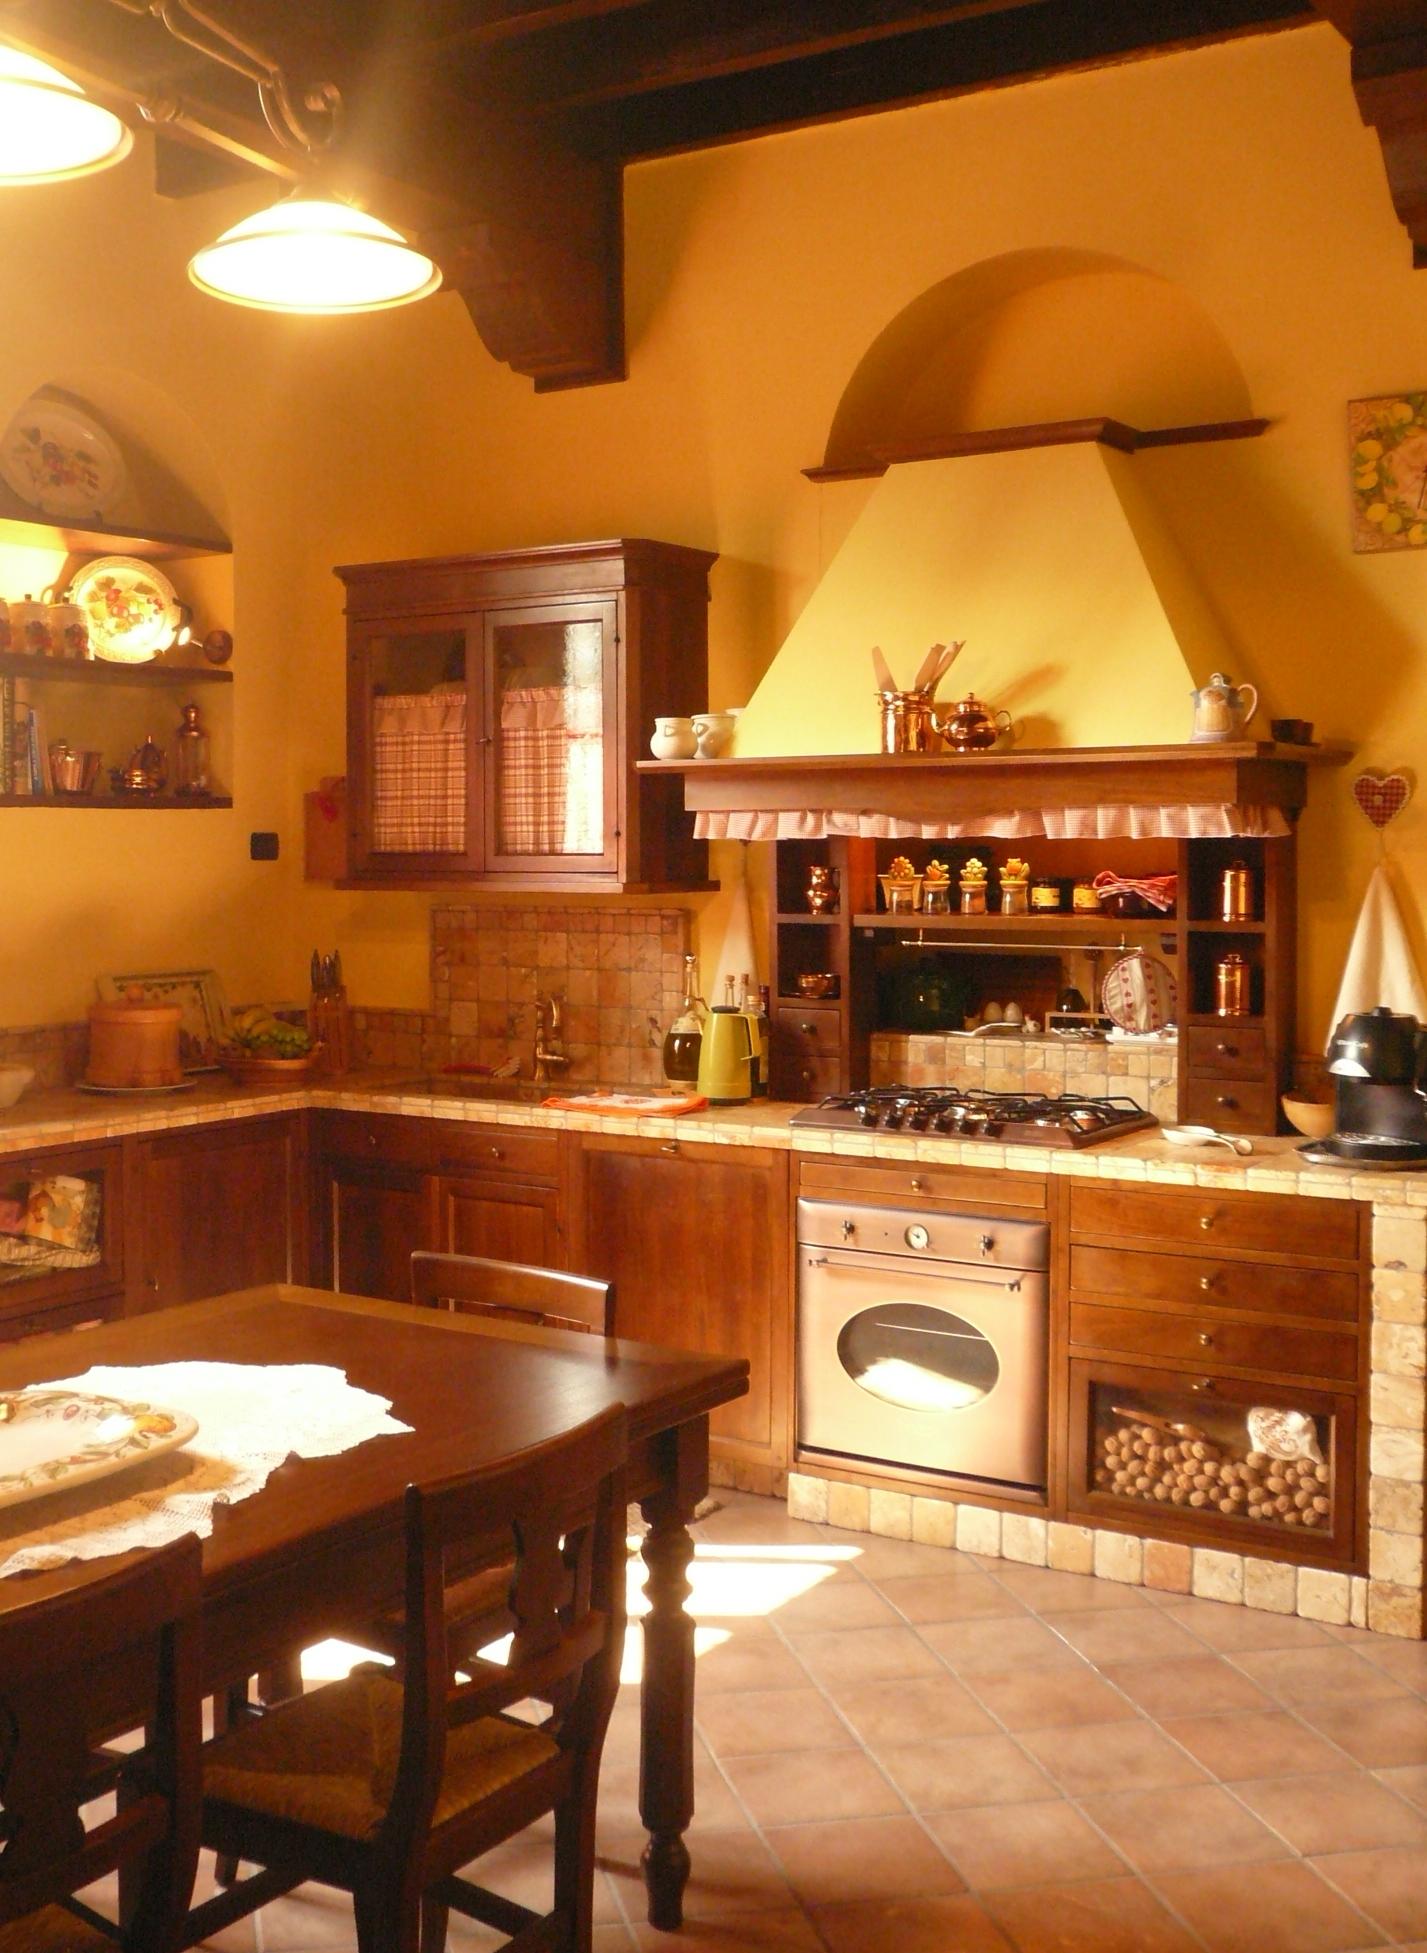 Cucina Doralice - Marchi cucine